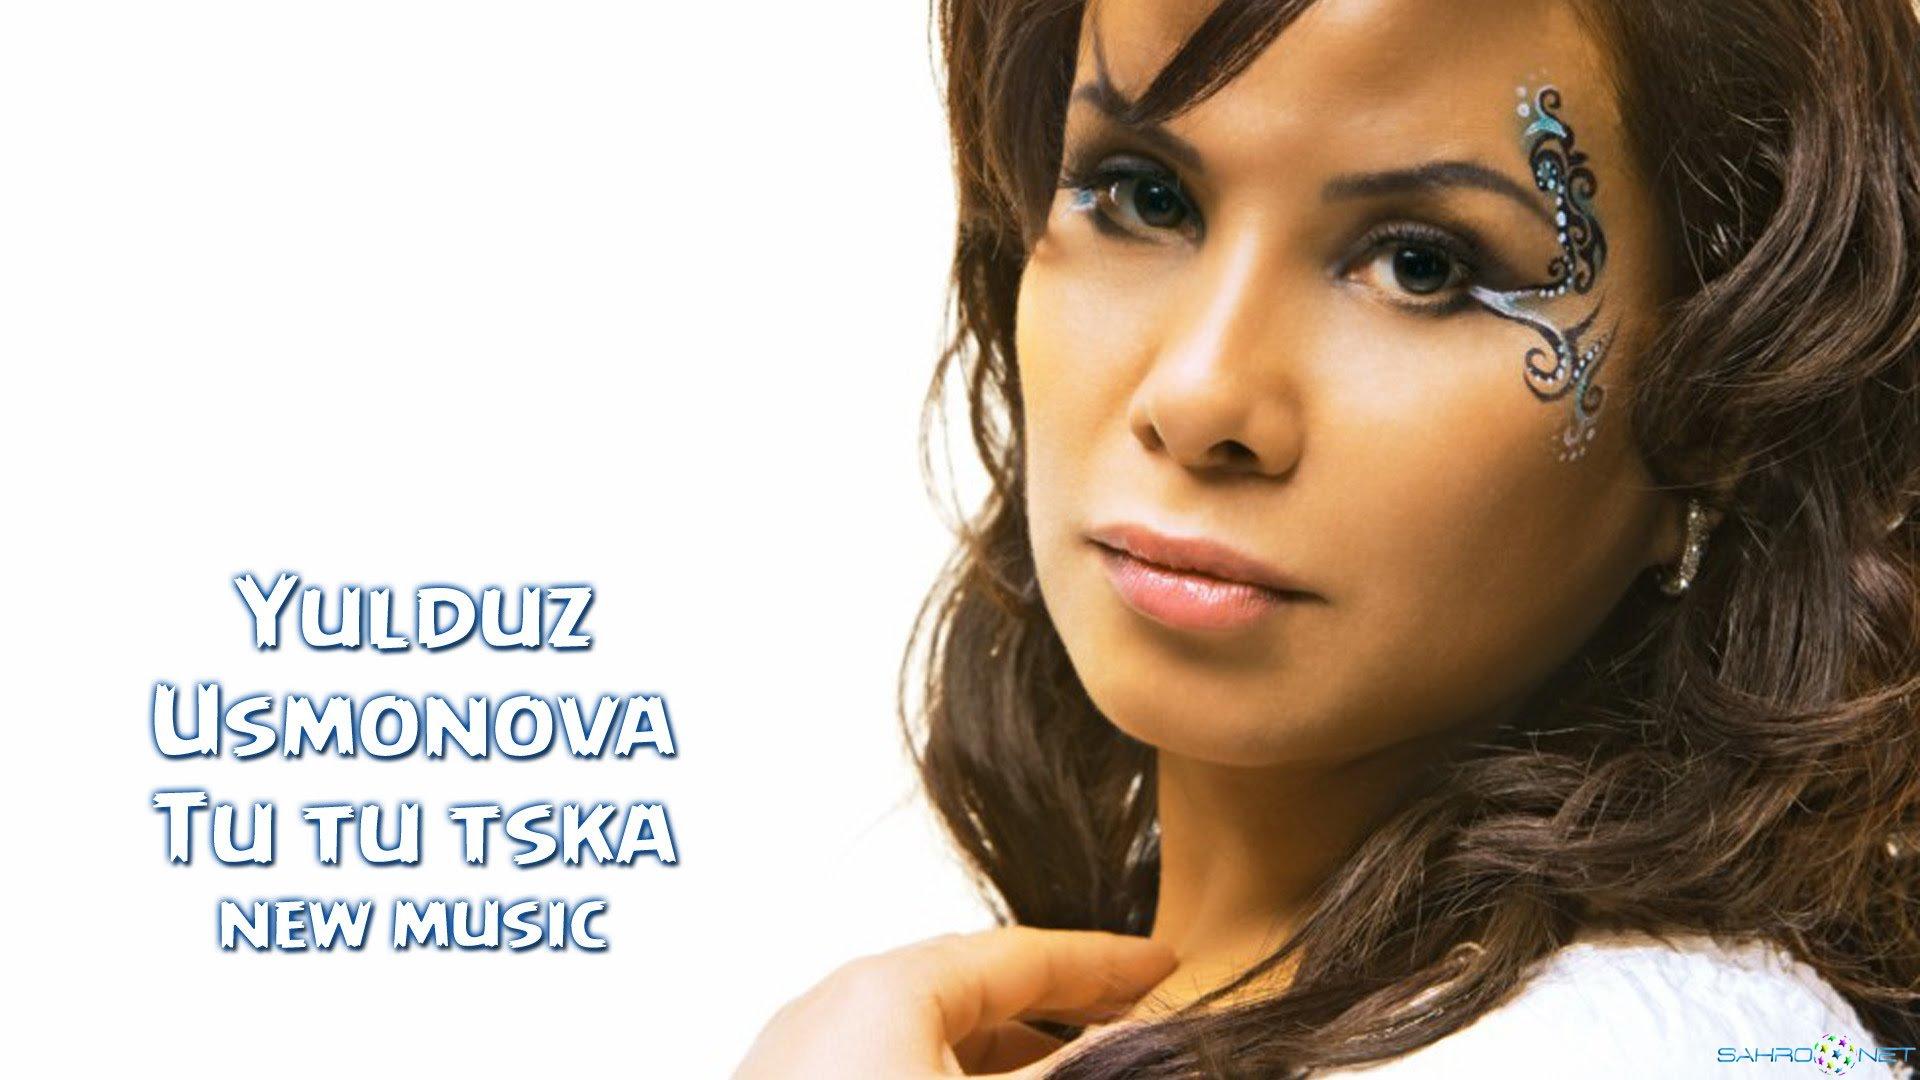 Yulduz Usmonova - Tu tu tska 2015 скачать